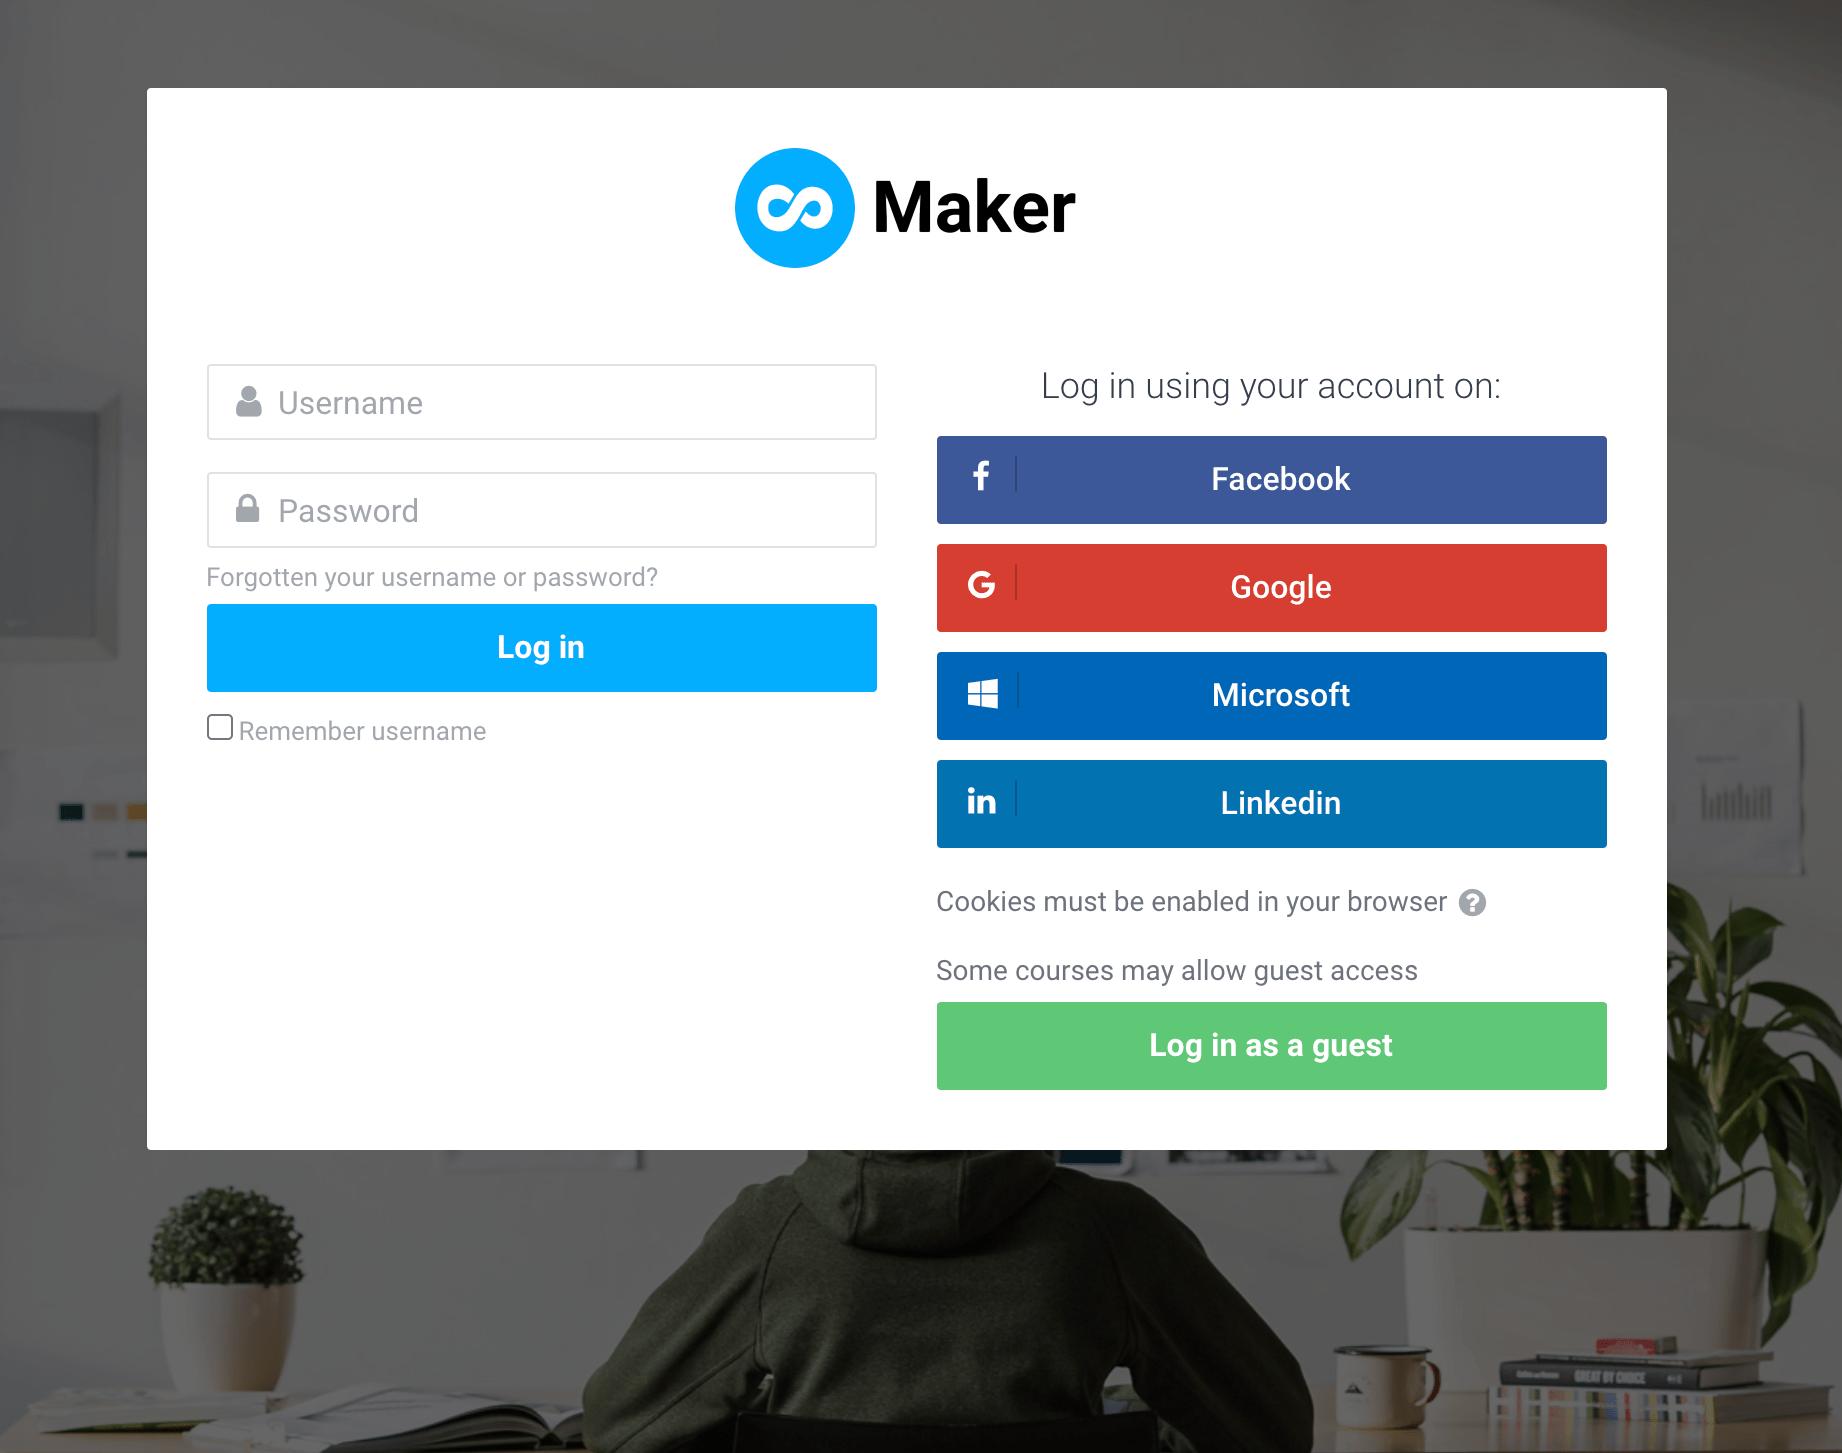 moodle-login-page-default-layout